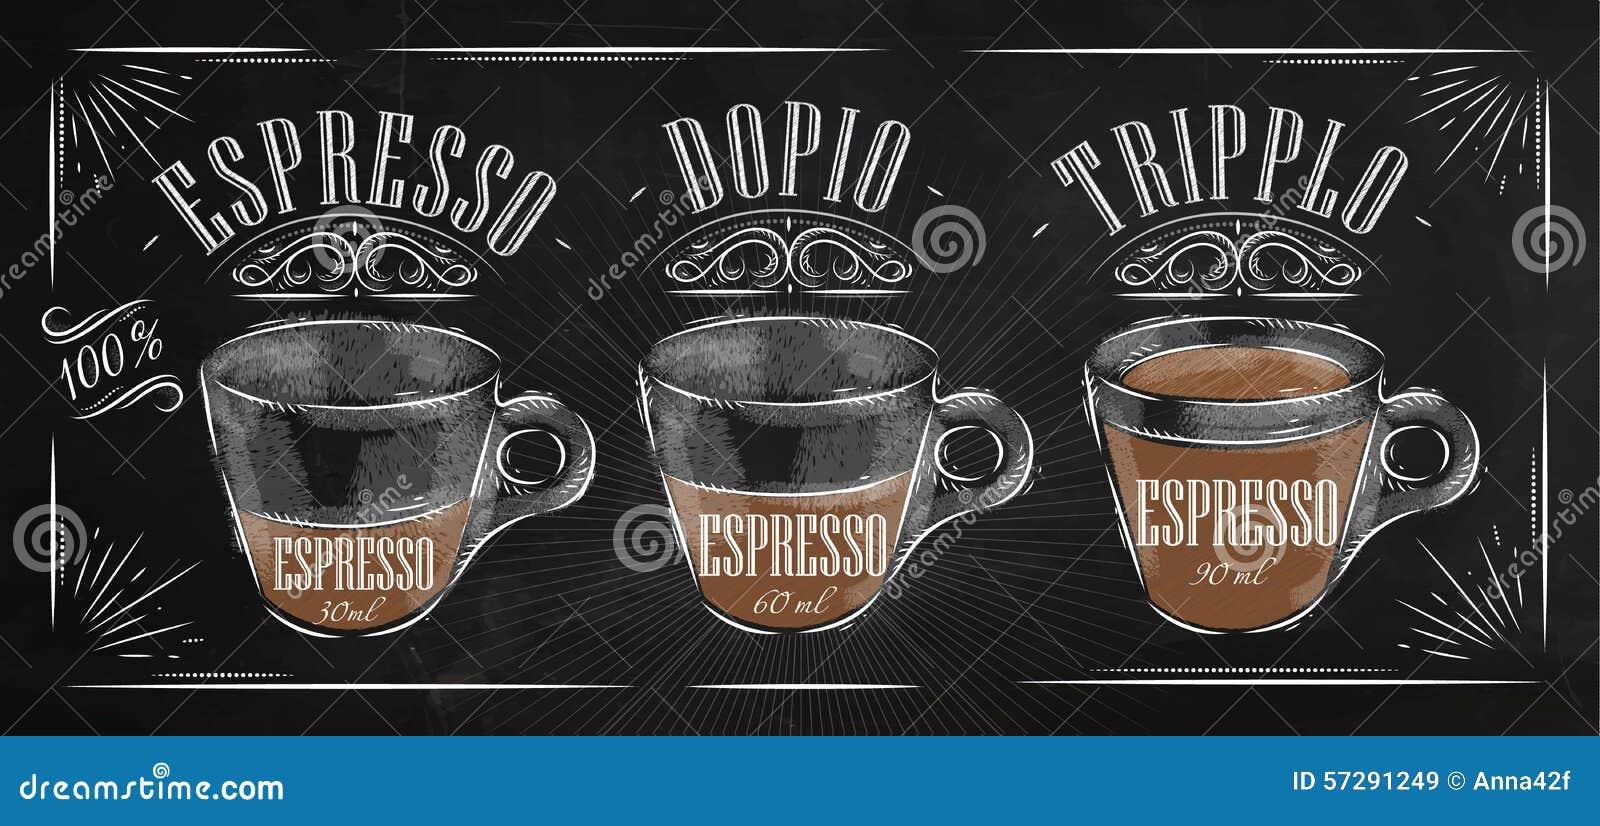 Poster Espresso Chalk Stock Vector - Image: 57291249